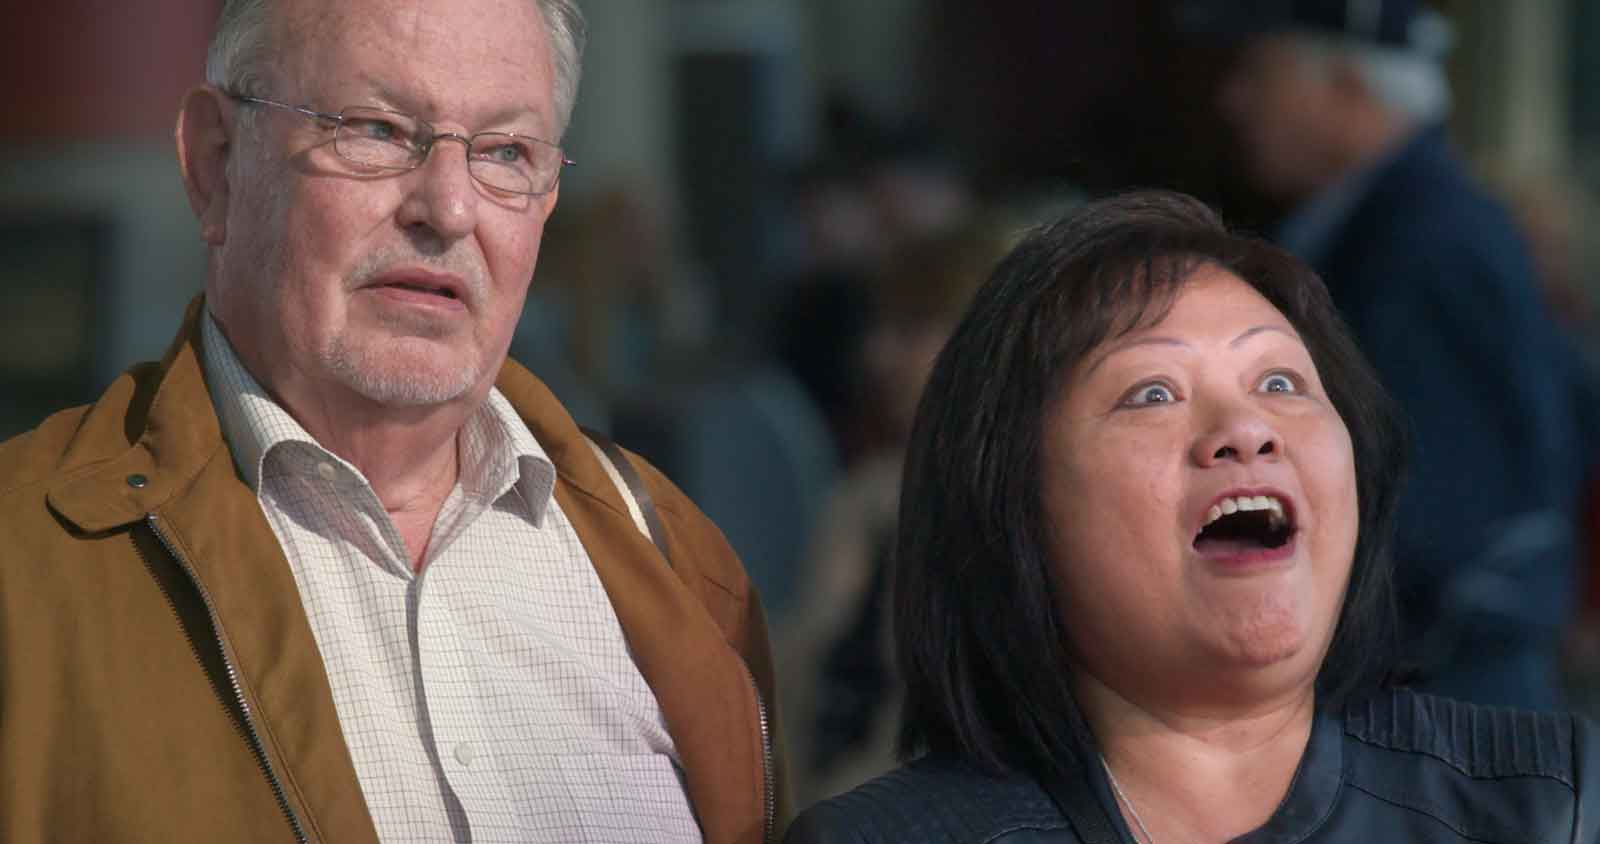 Roger and Linda Johnson reaction to earning a Virgin Atlantic upgrade